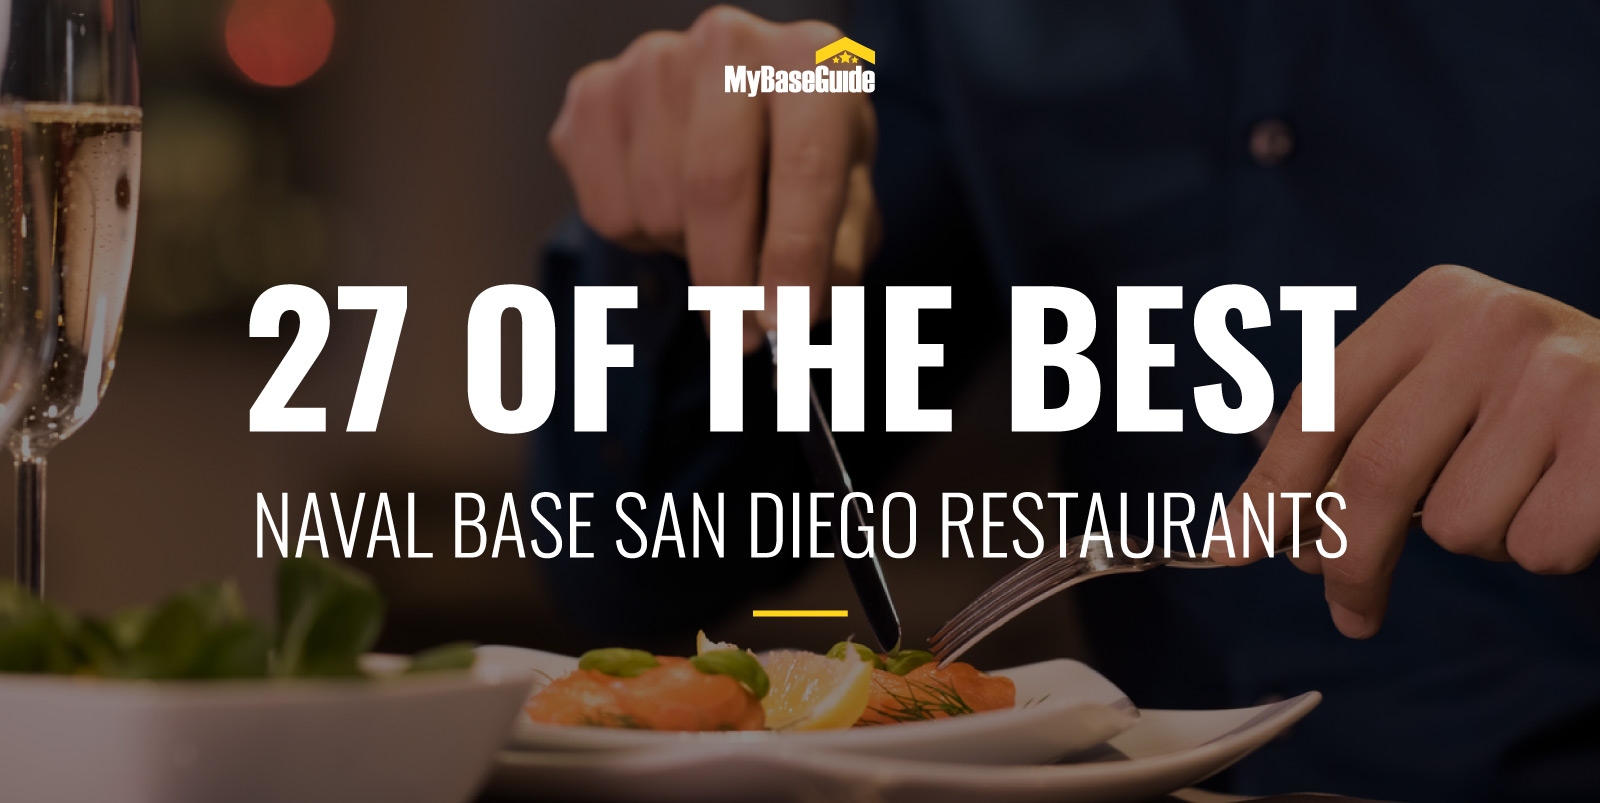 27 Of the Best Restaurants Near Naval Base San Diego